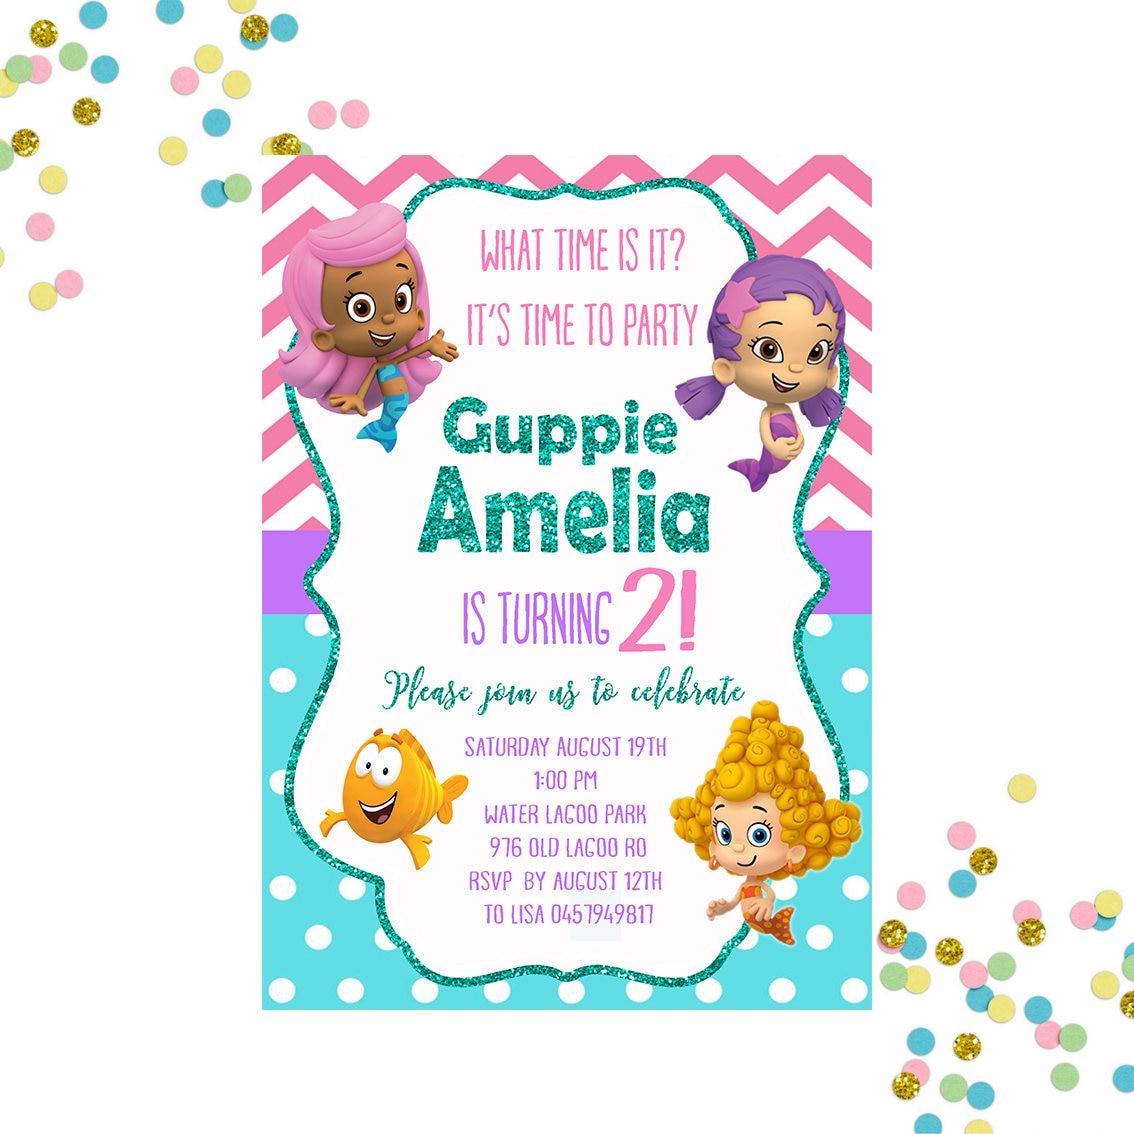 Bubble Guppies Invitation Bubble Guppies Birthday Invitation   Etsy